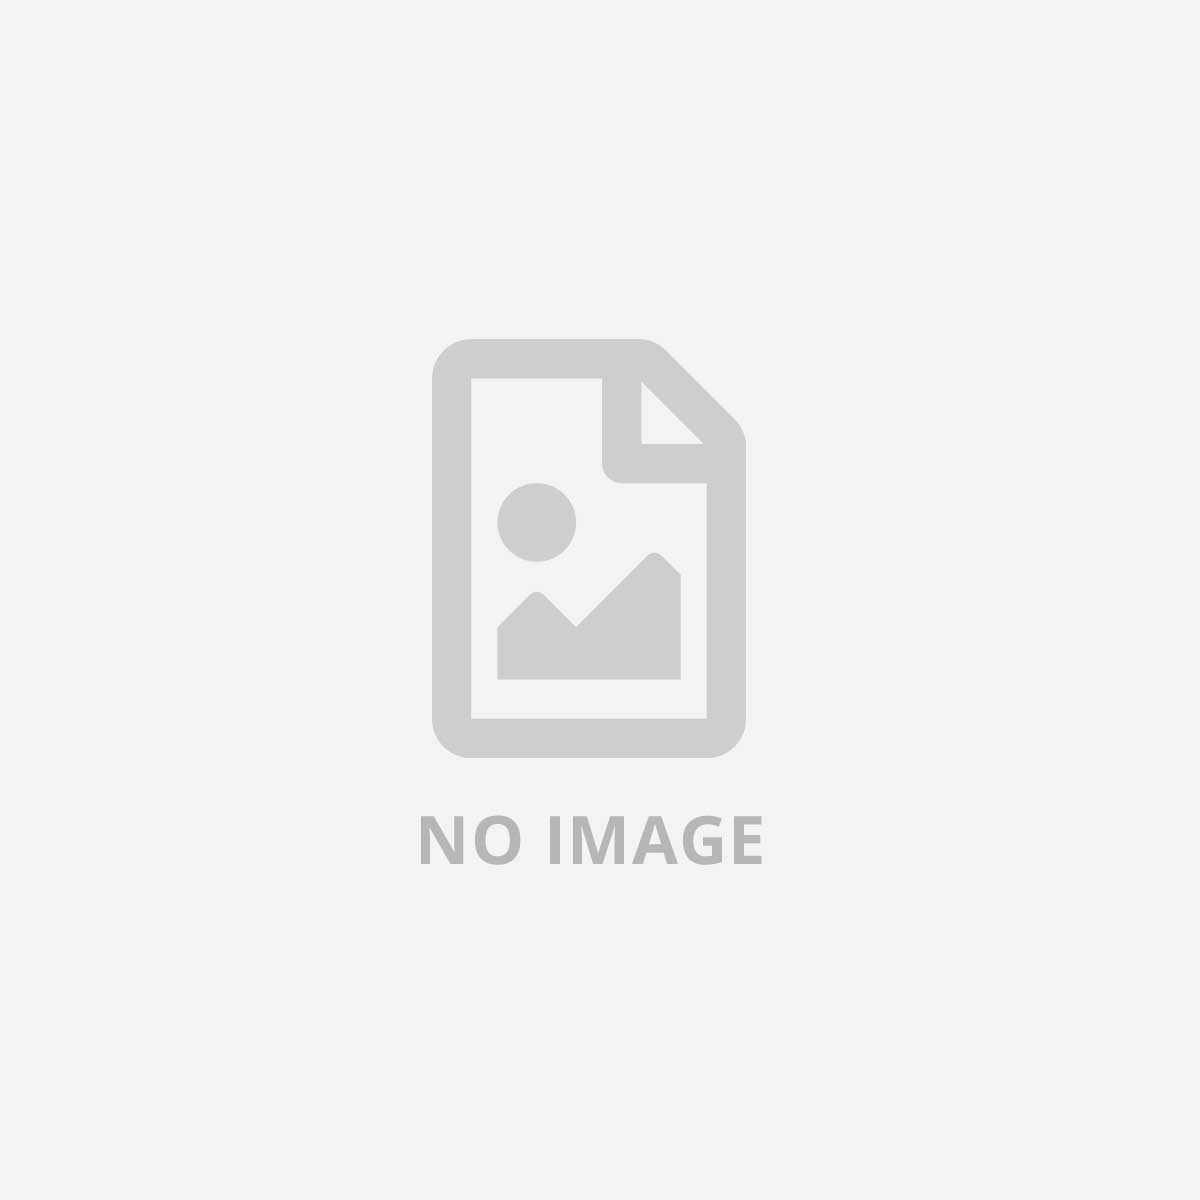 CANON PP-201 10X15 PLUSS GLOSSY 5 FOGLI